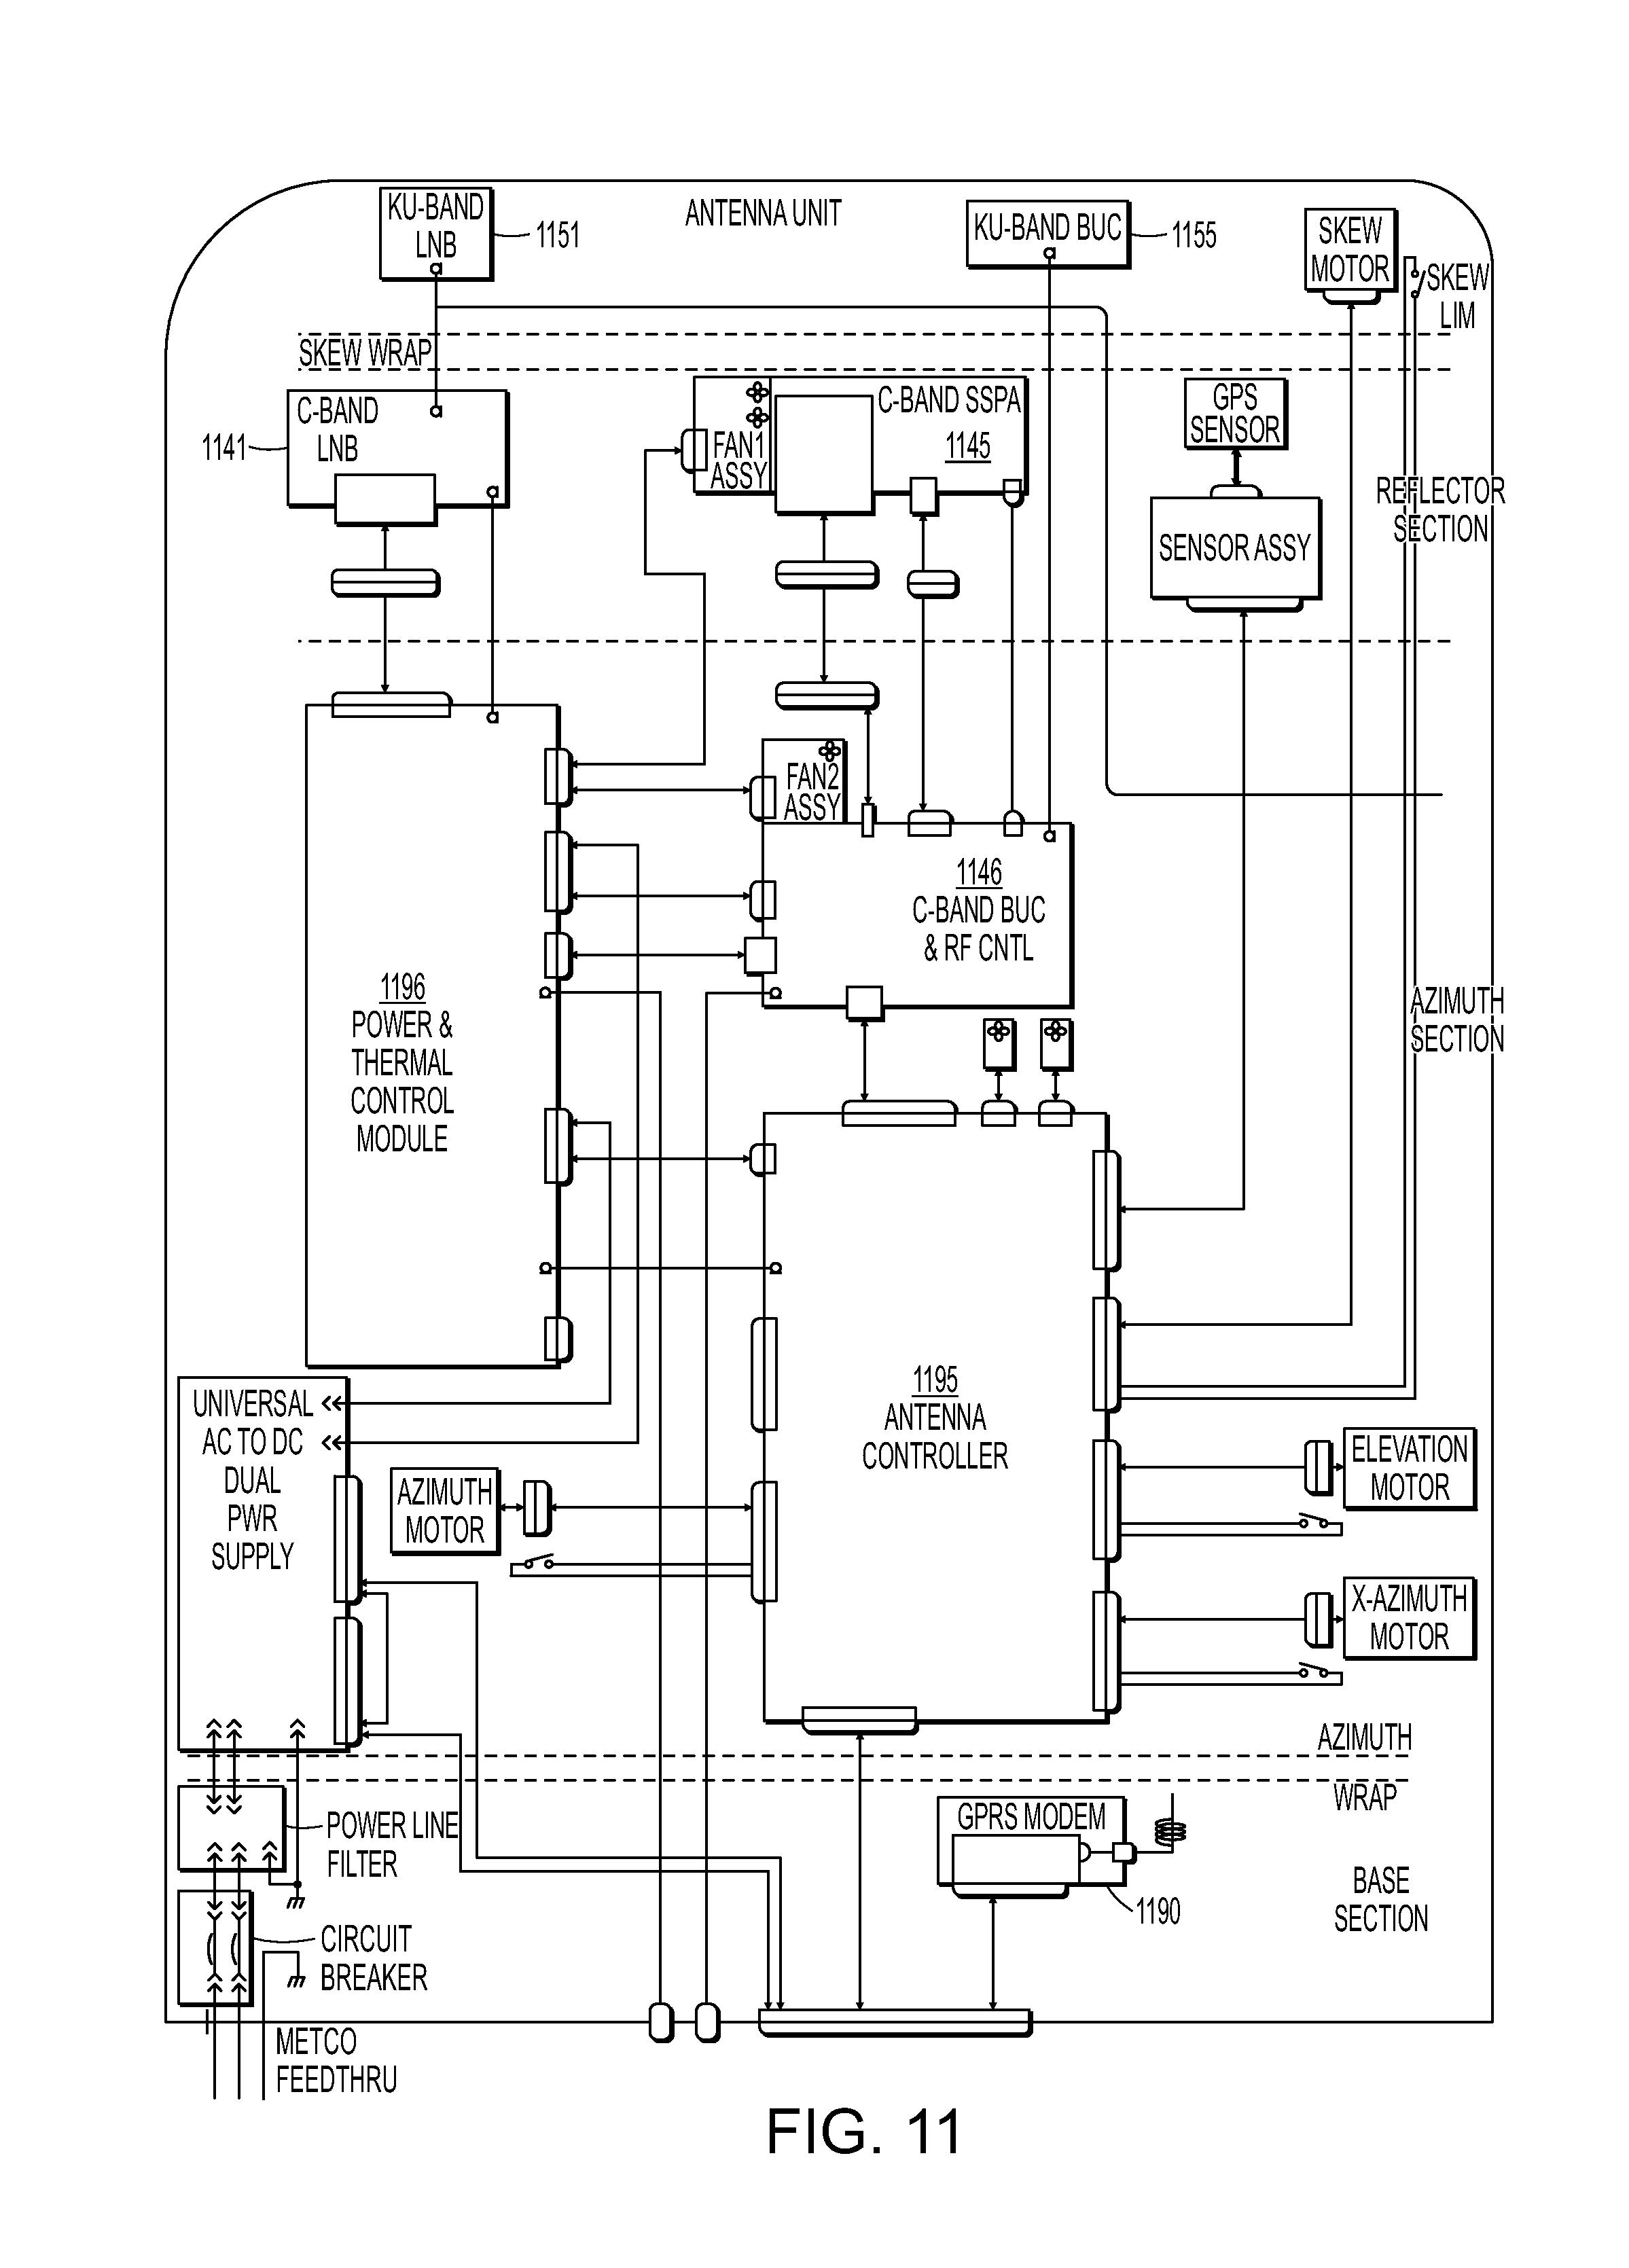 c band lnb circuit diagram hl 0804  dish pro lnbf wiring diagram  hl 0804  dish pro lnbf wiring diagram